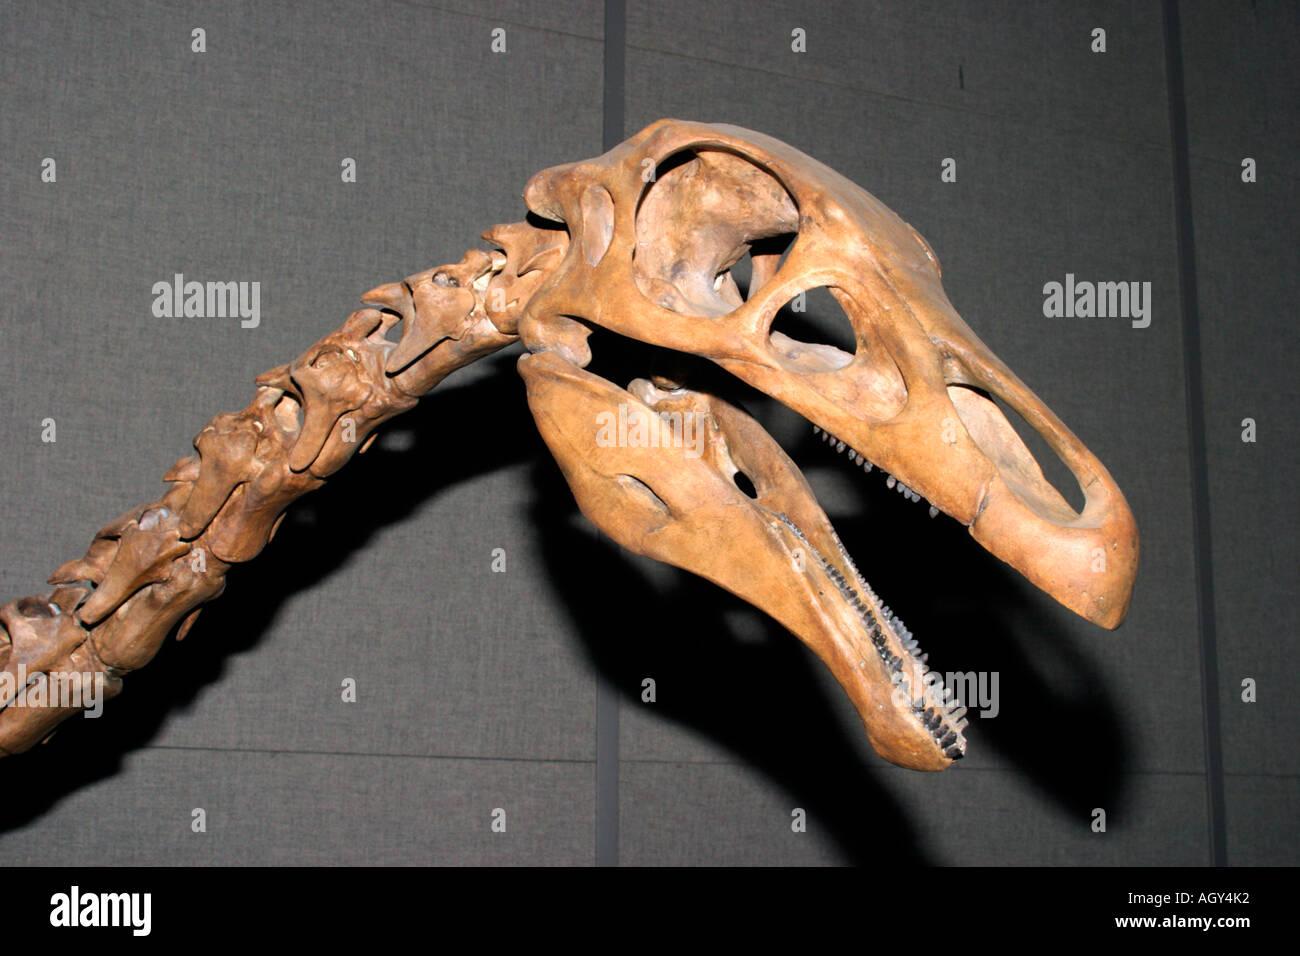 Skeletal replica of Alkasaurus dinosaur skull, Royal Tyrrell Museum, Drumheller, Alberta, Canada. - Stock Image